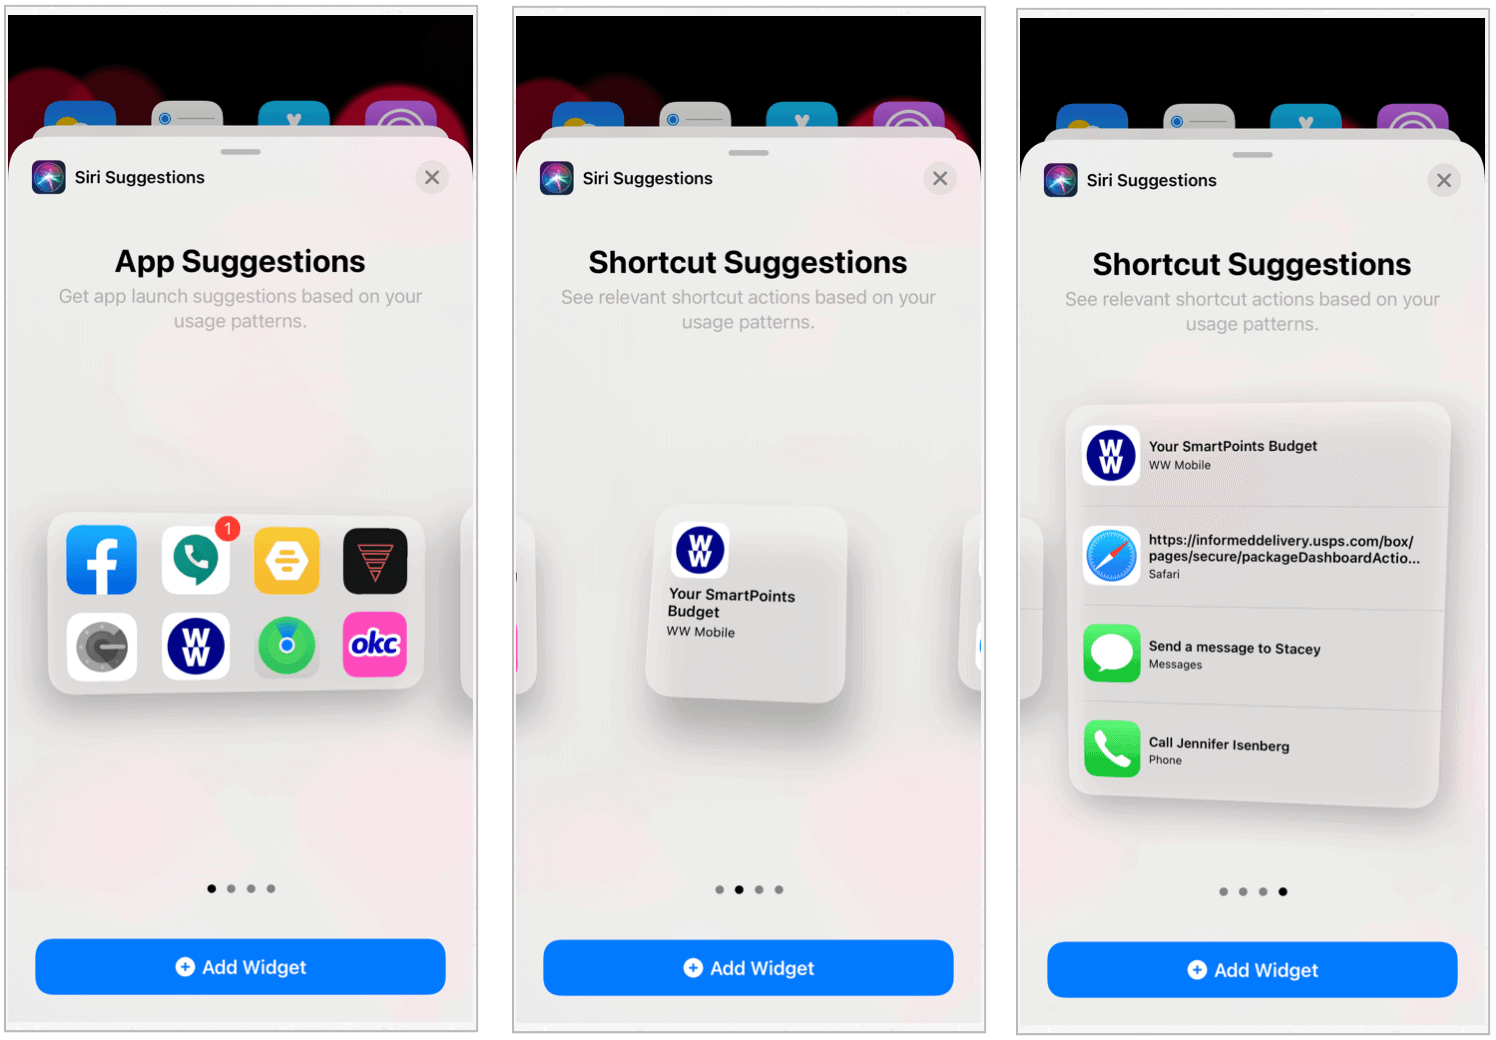 iOS 14 siri suggestions